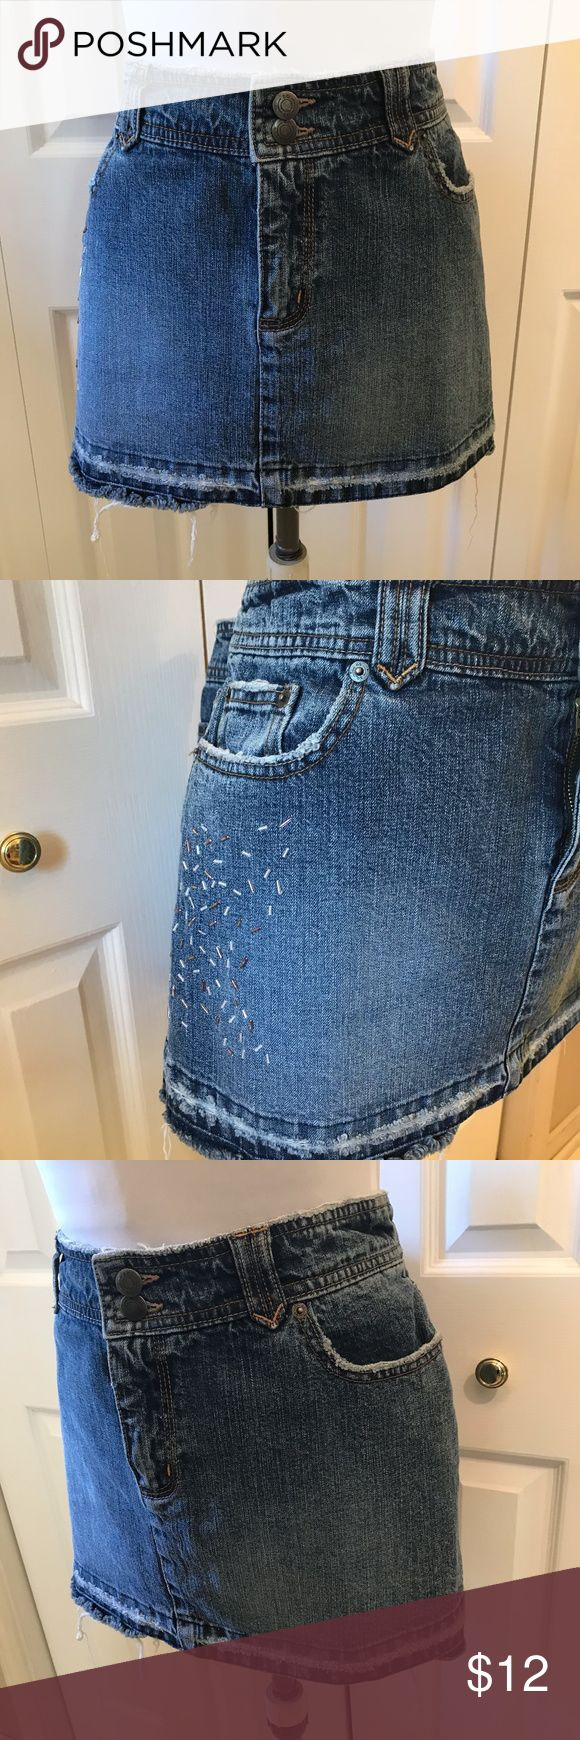 """So"" Jean Mini Skirt Beaded Raw Hem Distressed 13 ""So"" Jean Mini Skirt Beaded Raw Hem Distressed 13 Waist: 34"" Hip: 41"" Length: 12"" So Skirts Mini"